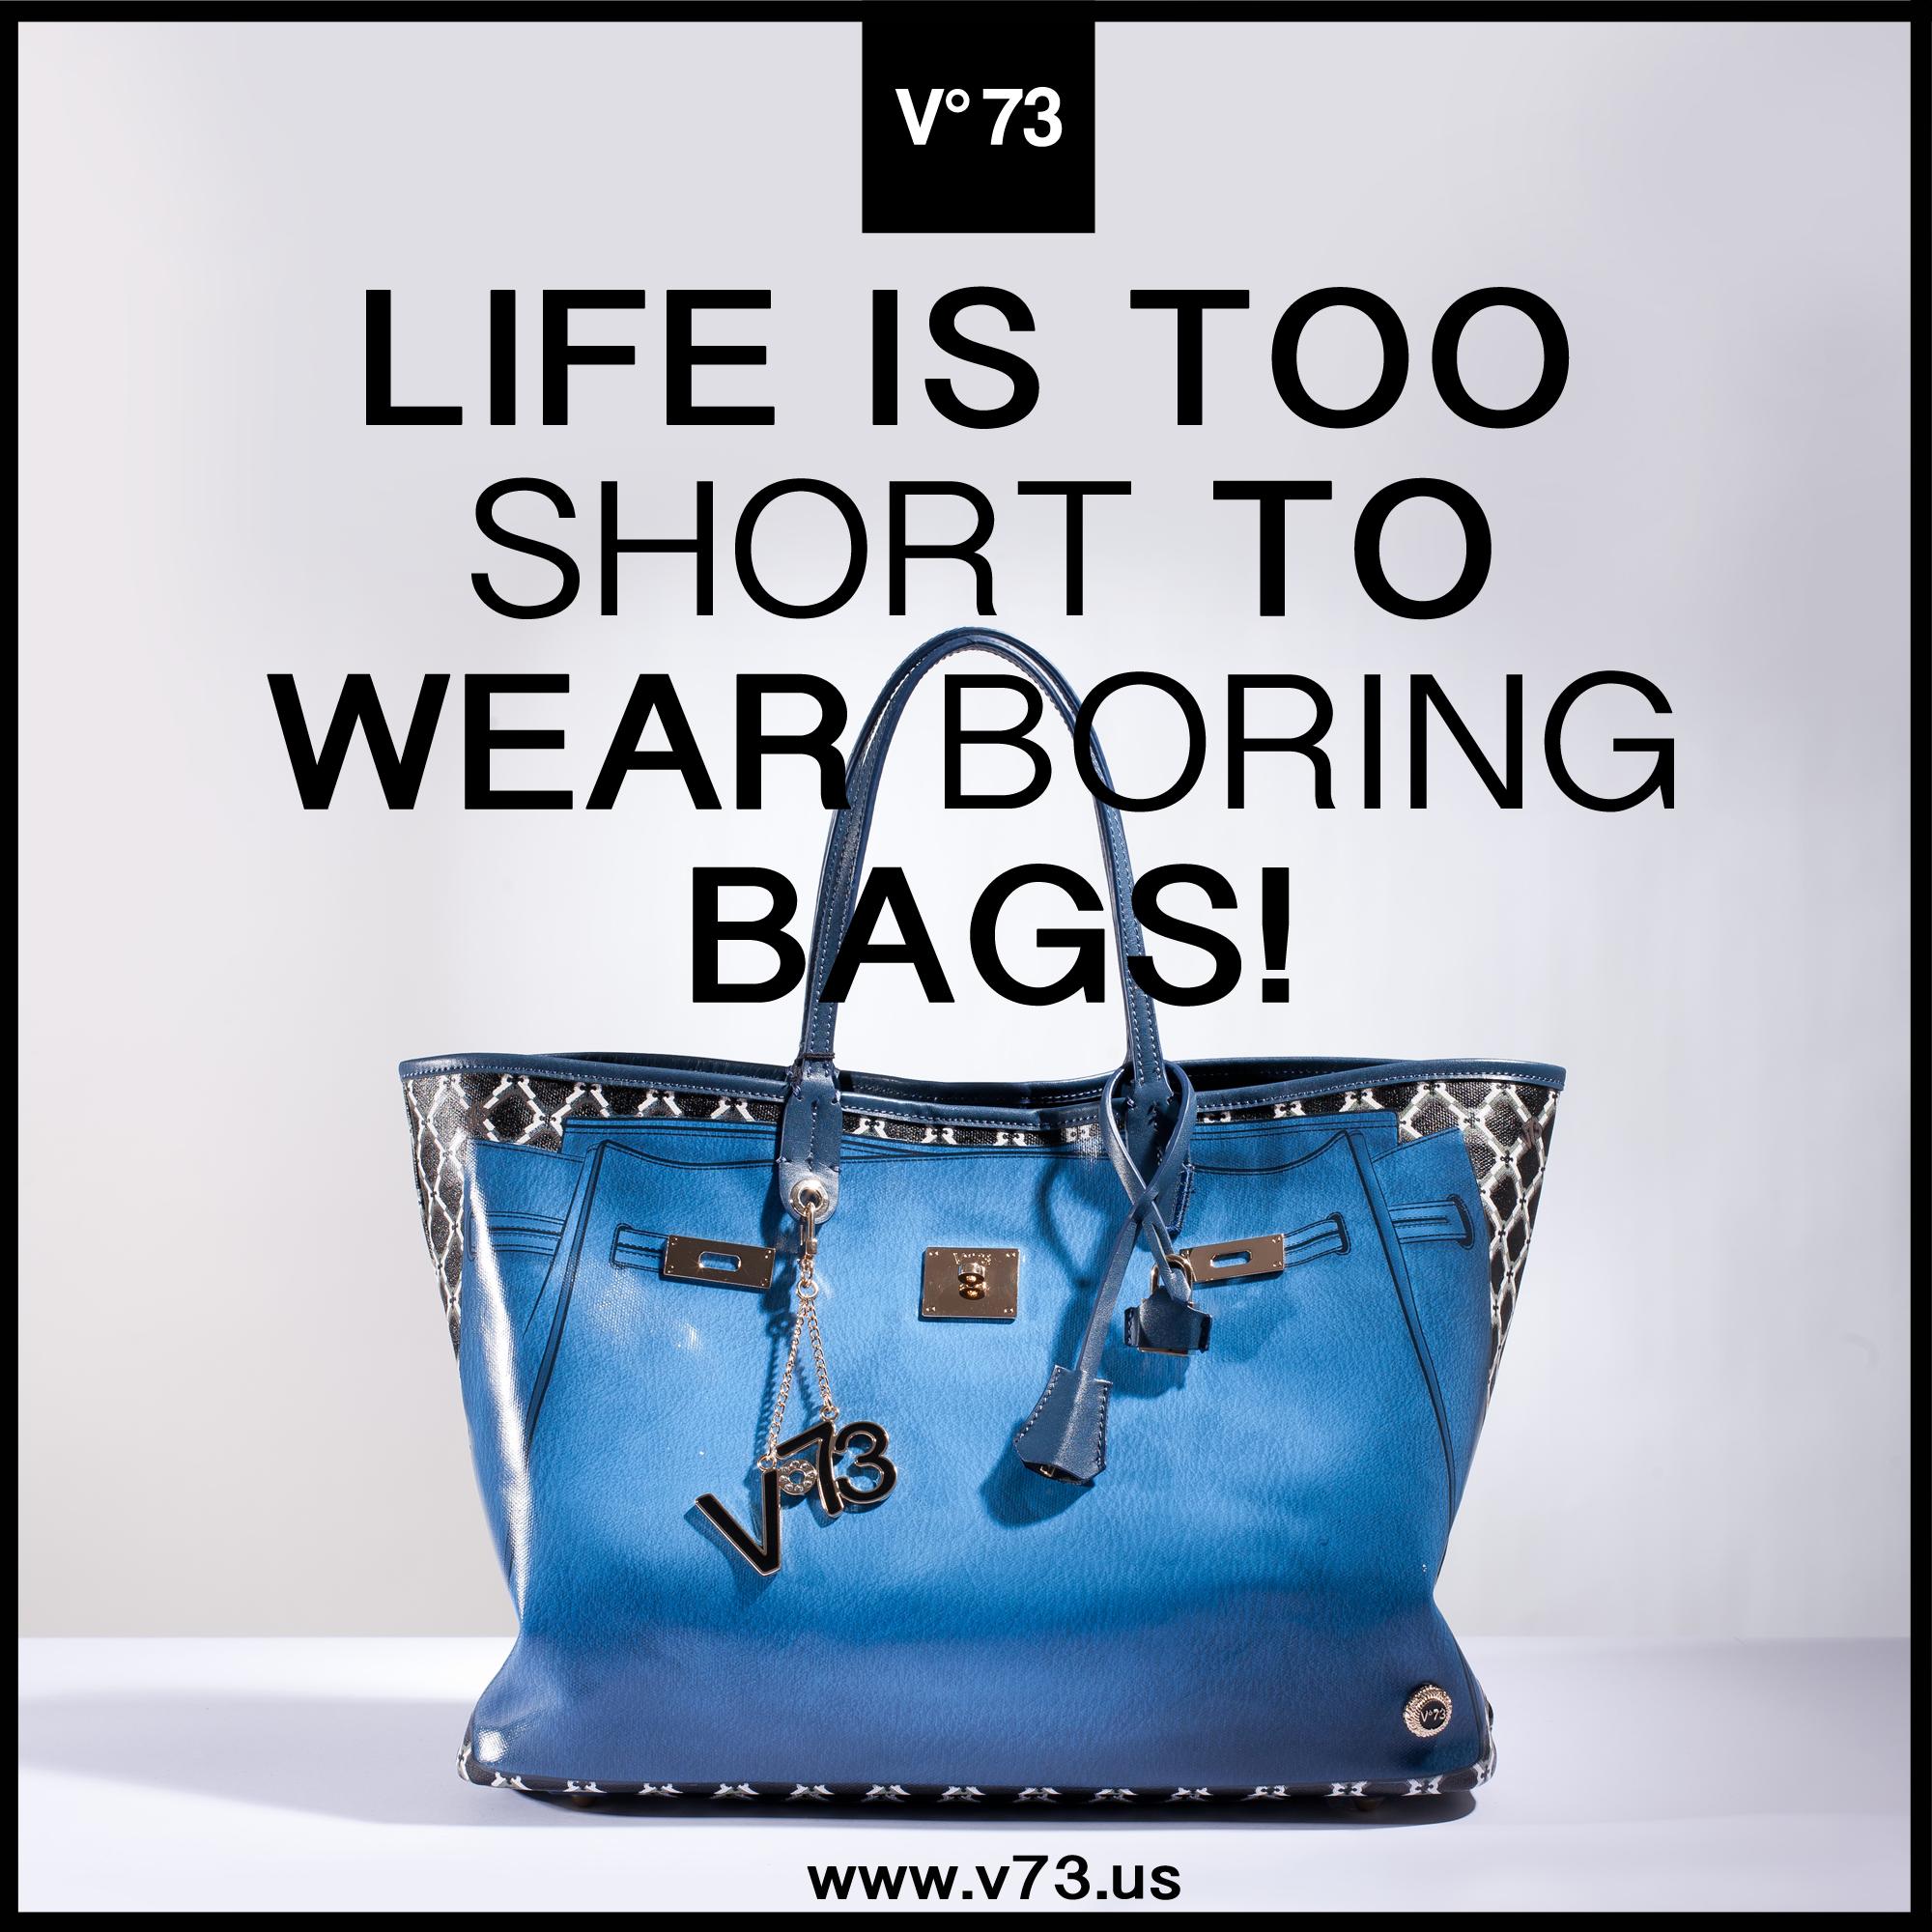 V 73 Bags And Accessories Bags And Accessories Fashion Quotes Bag Handbag Quotes Bag Quotes